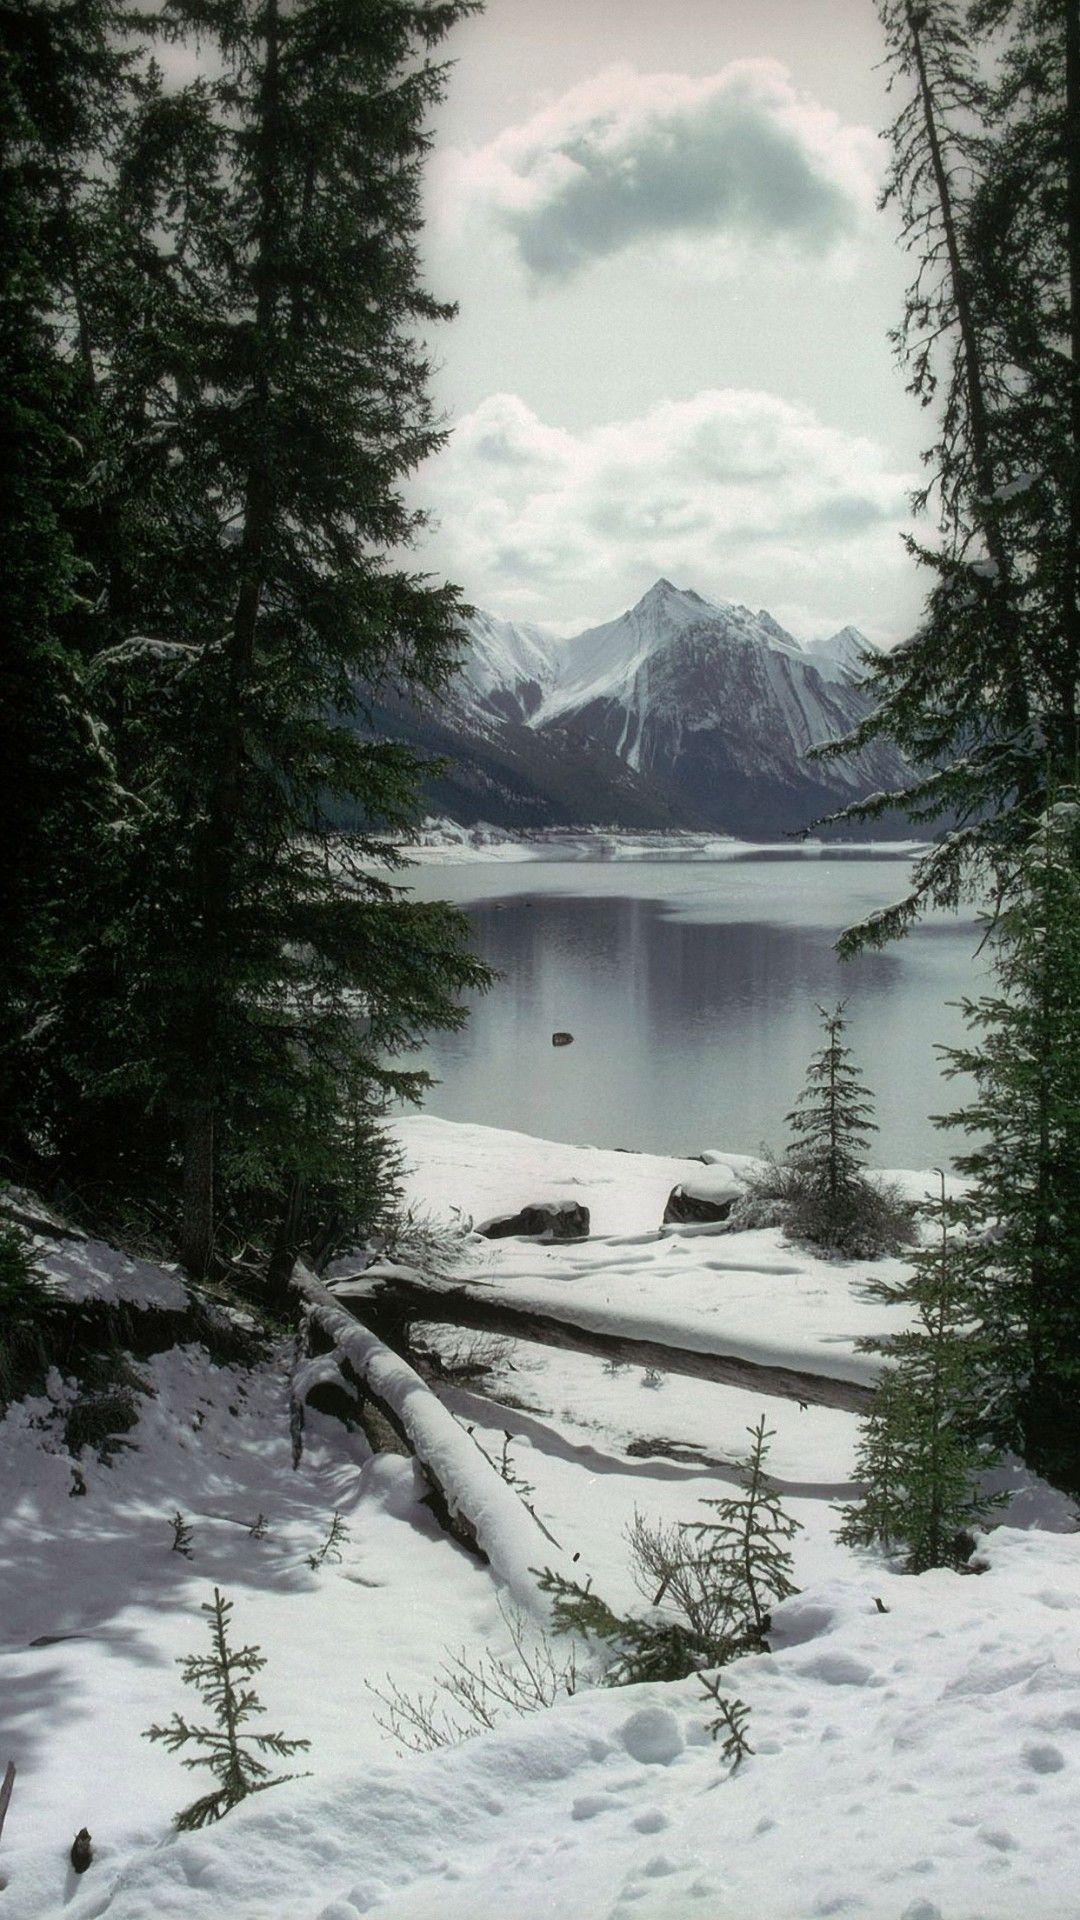 Photo of Fondo de pantalla para iPhone Pretty Winter | ipcwallpapers